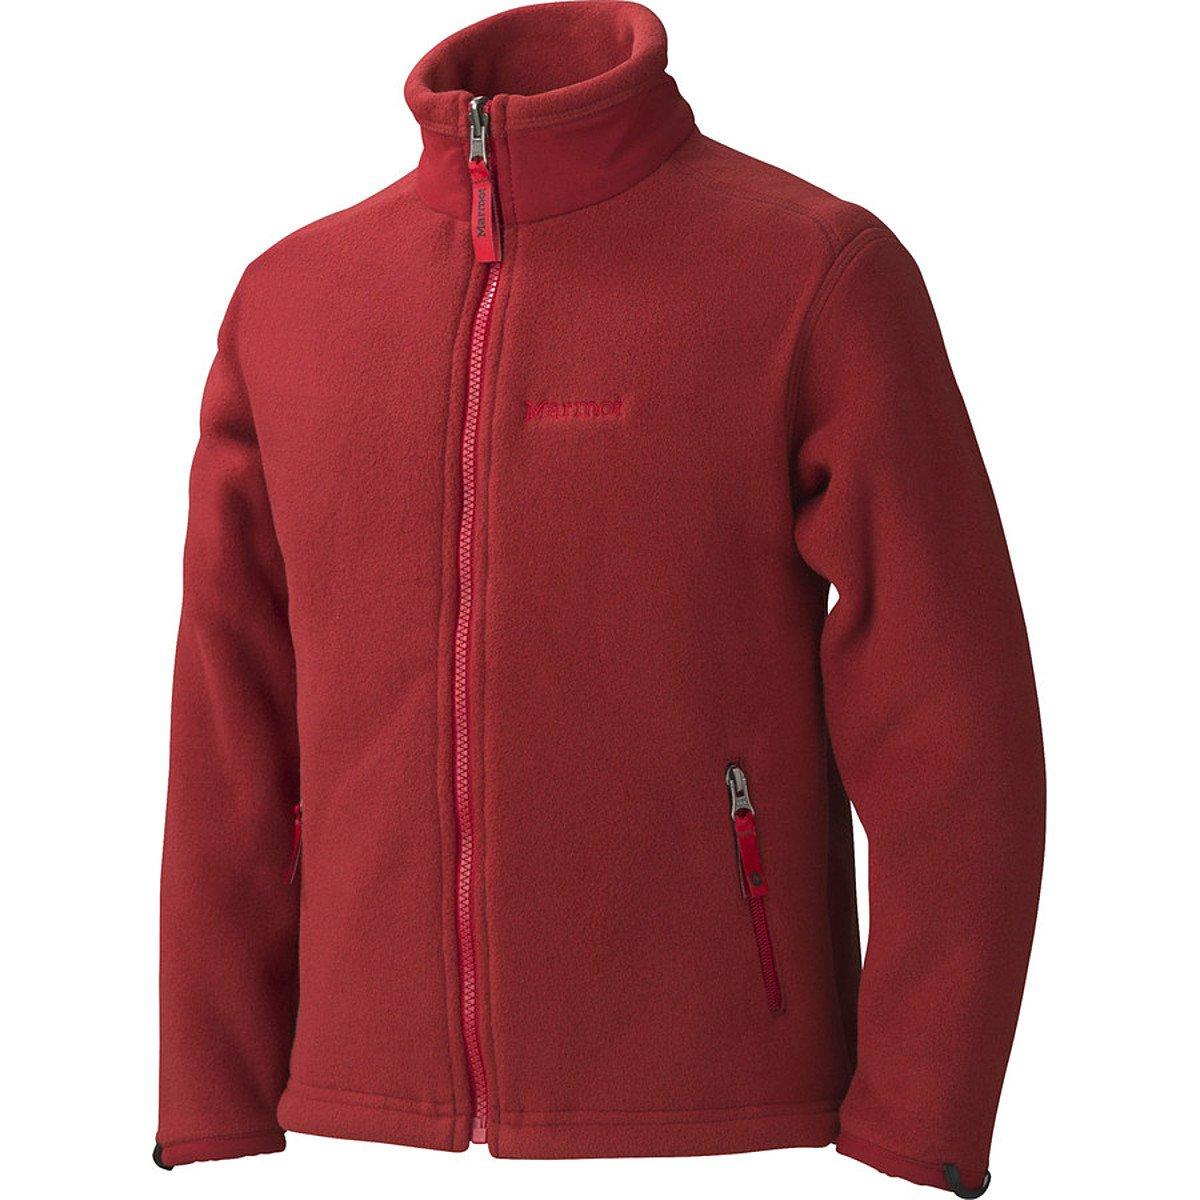 Amazon.com   Marmot Northshore 3-in-1 Jacket - Boys  Team Red Dark Crimson f95d553c10